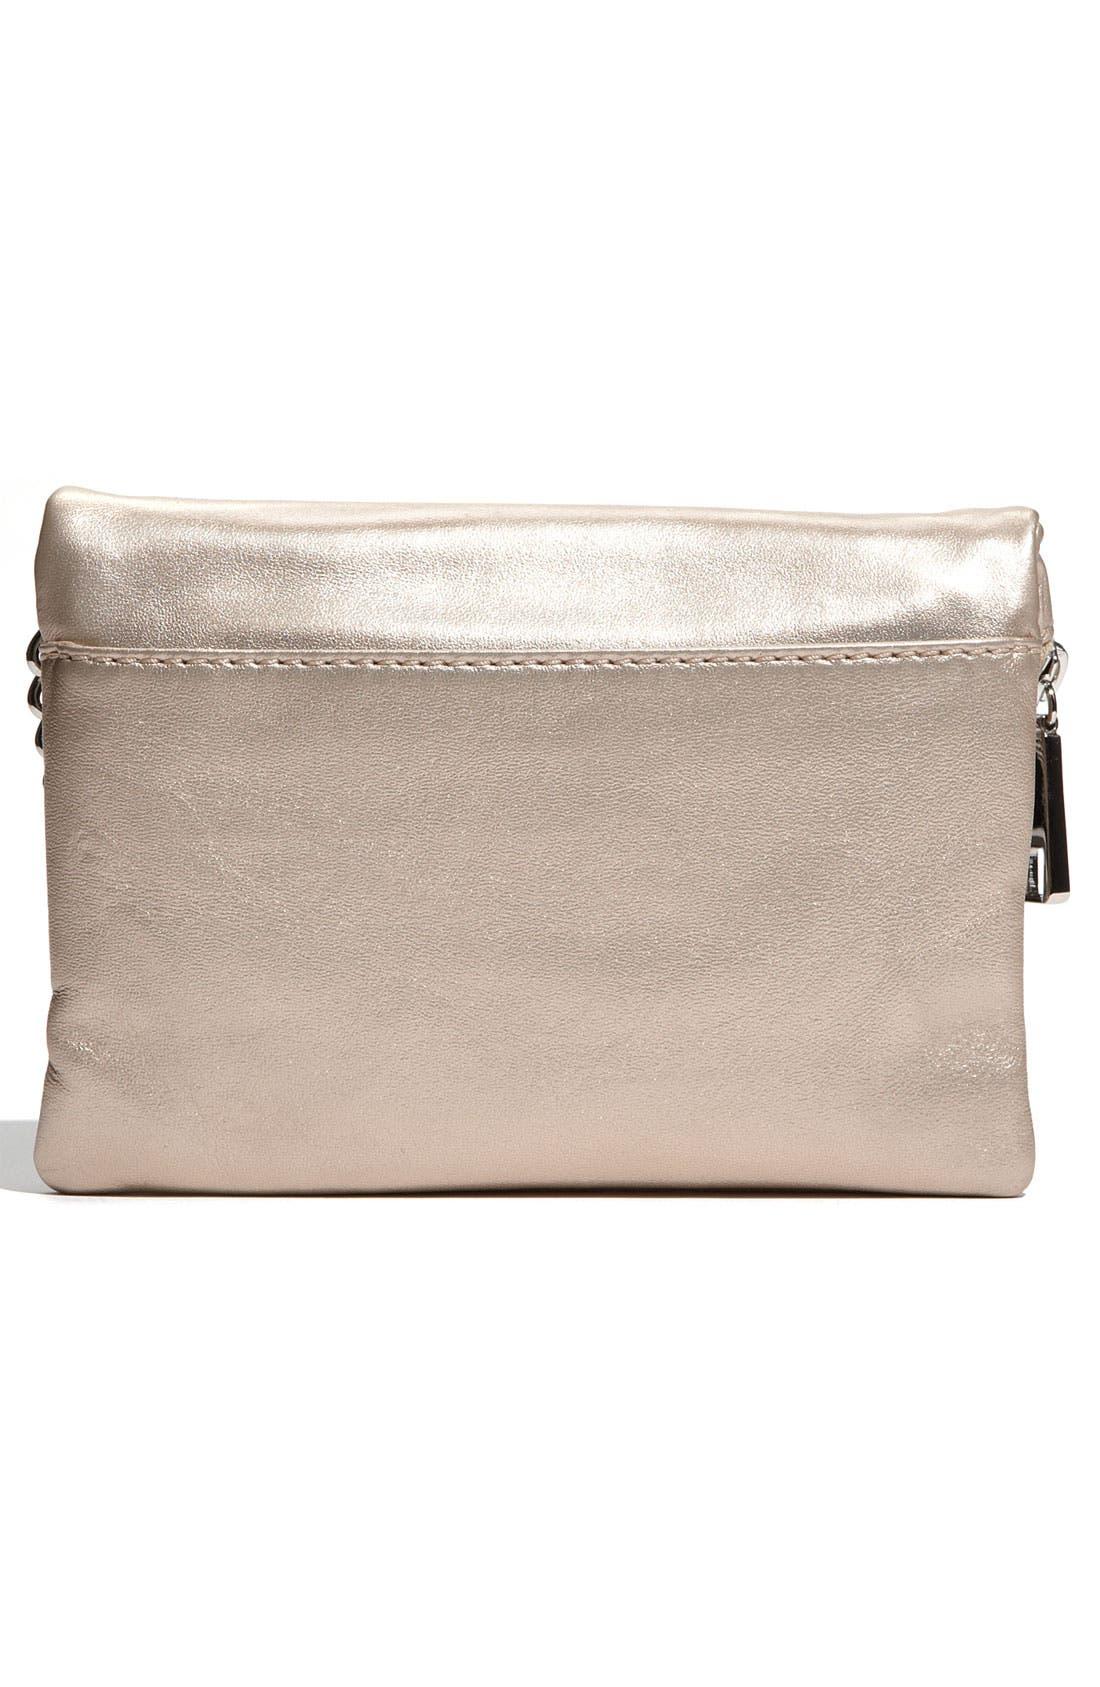 Alternate Image 4  - Hobo 'Daria' Metallic Leather Crossbody Bag